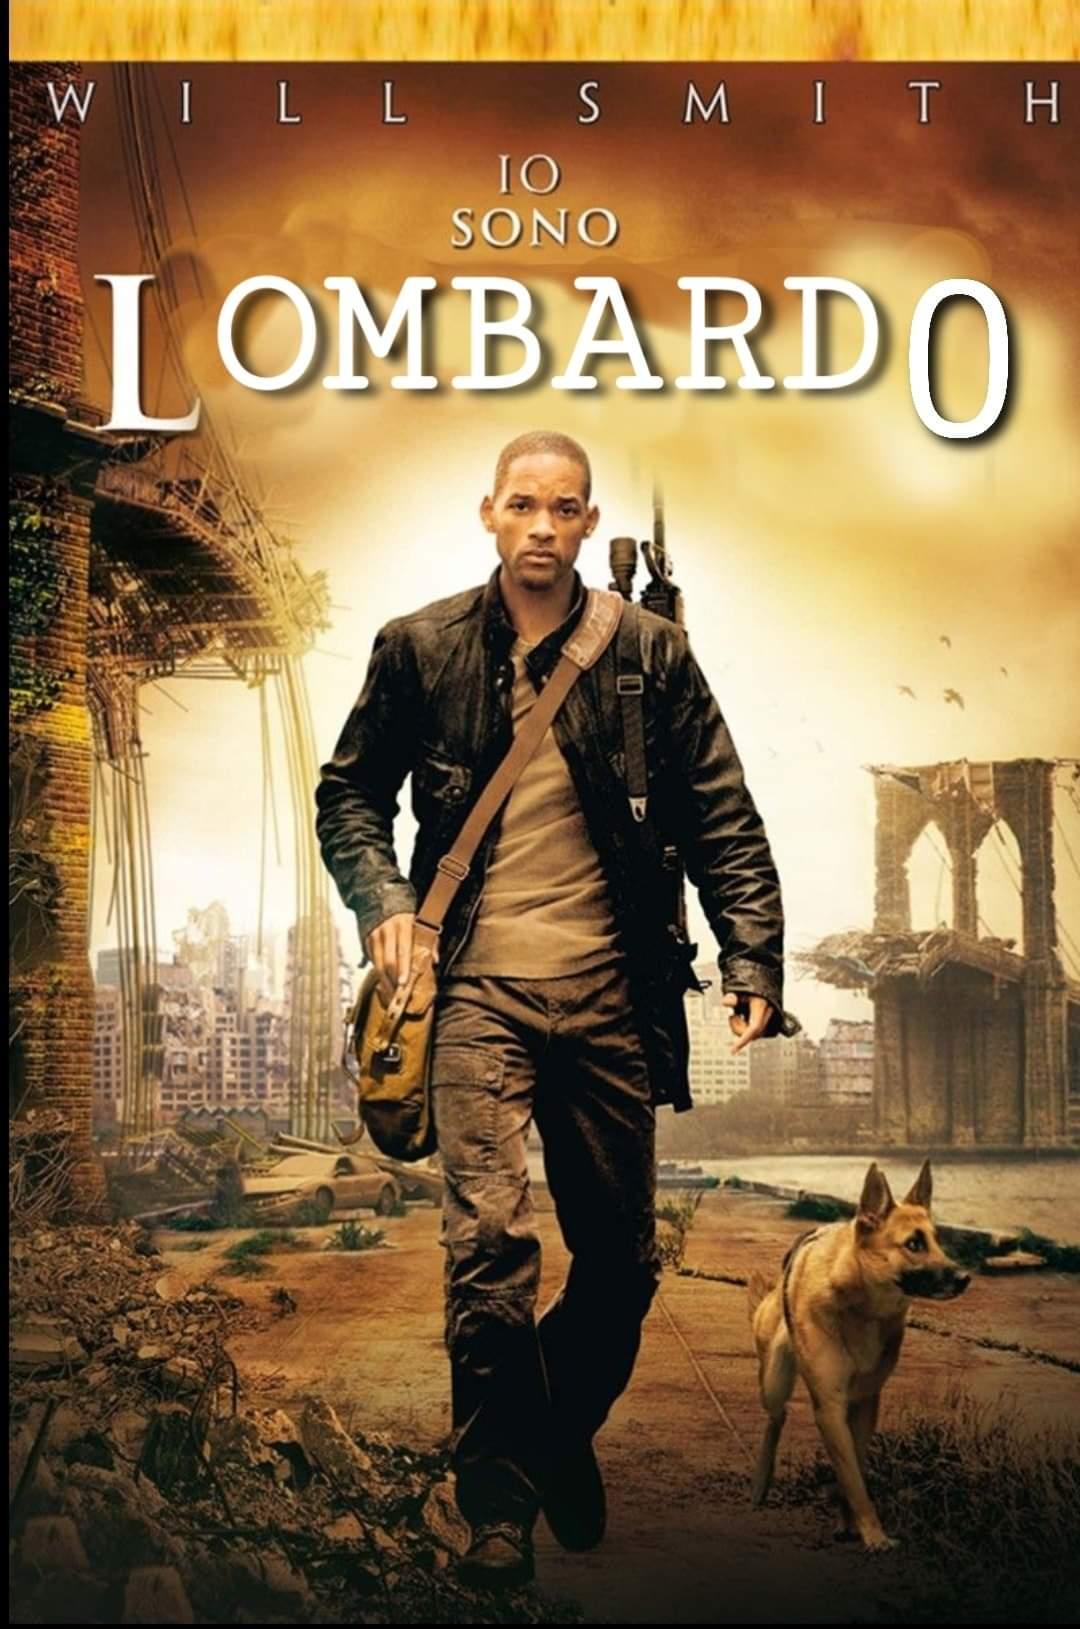 Io sono Lombardo, con Will Smith